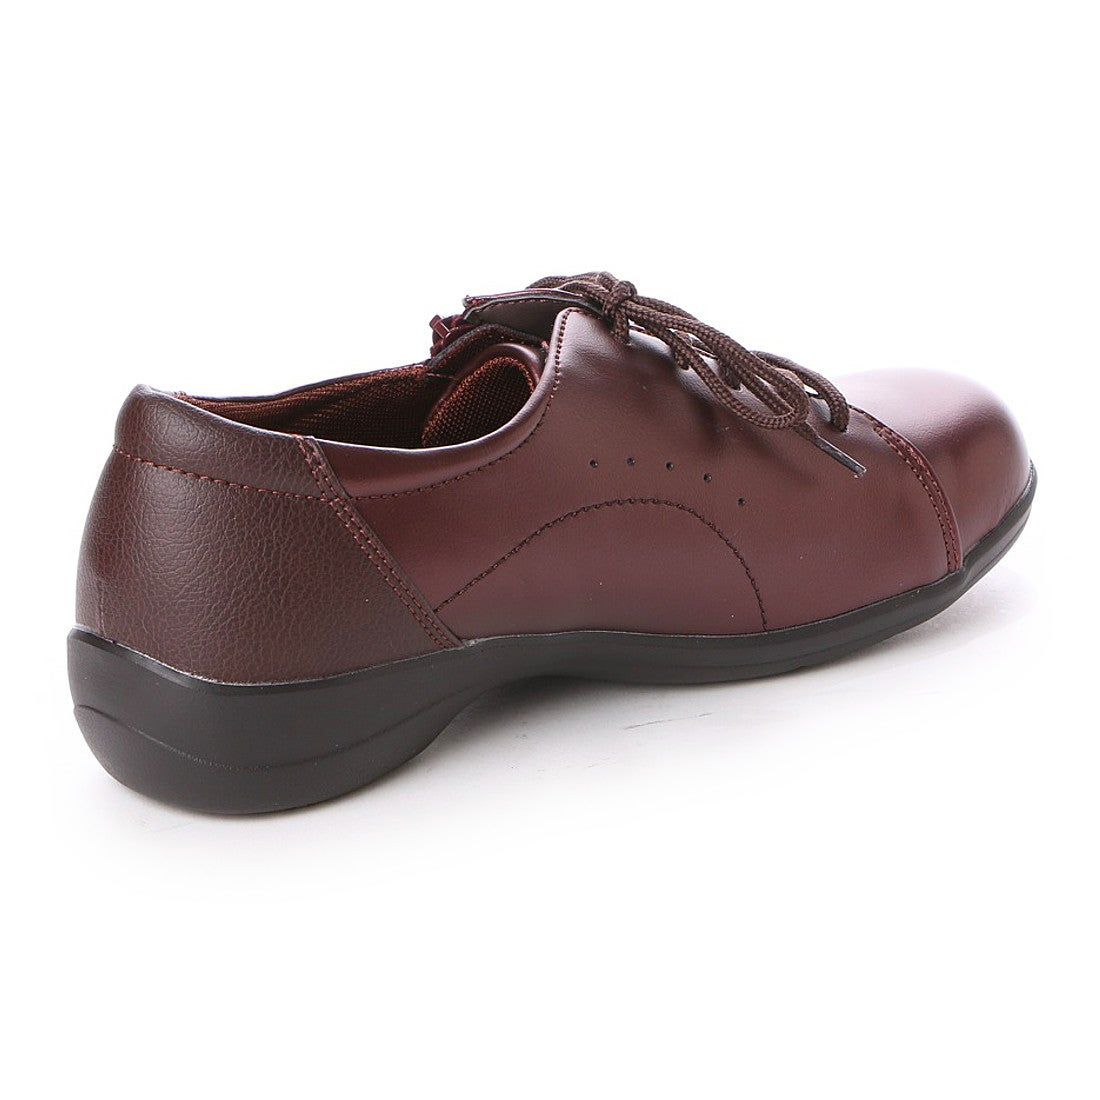 67464823e146a ムーンスターイブ MOONSTAR EVE レディース 短靴 EVE236 4980 ミフト ...